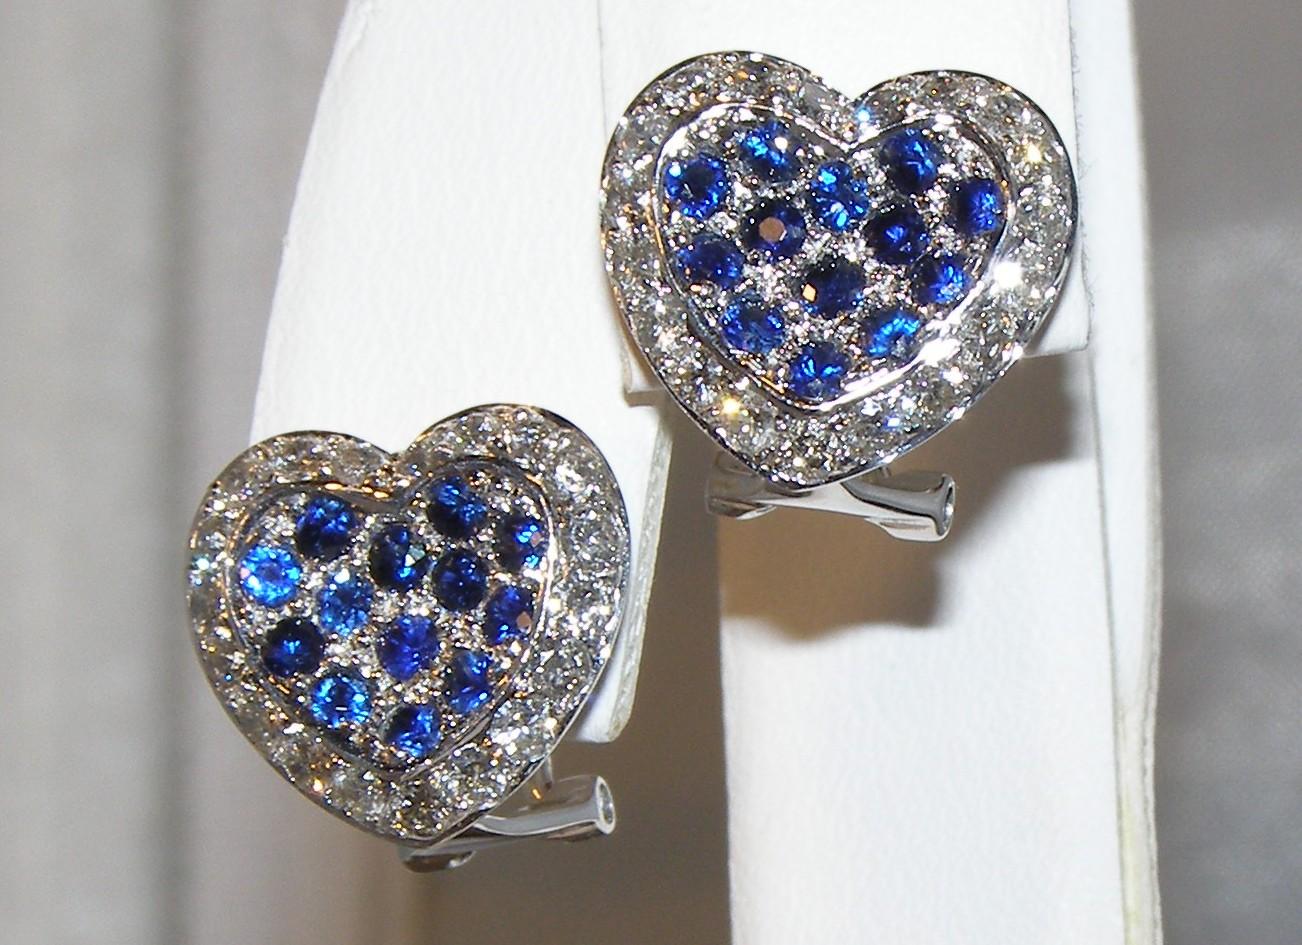 Pave Bright Blue Sapphire Diamond Earrings 18kwg 2 02 Ctw